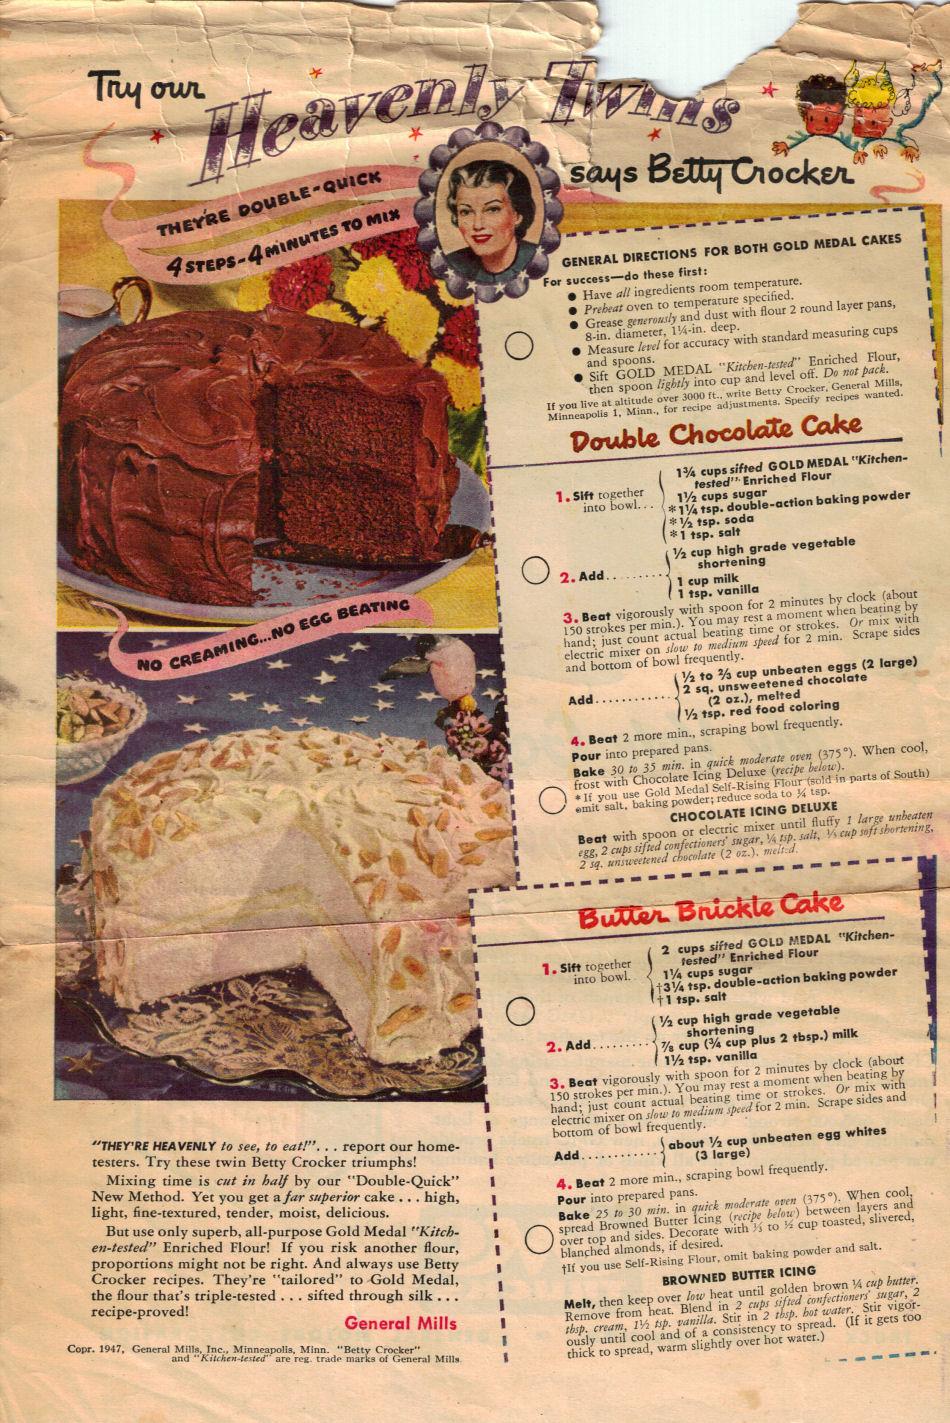 Quick Upside Down Cake